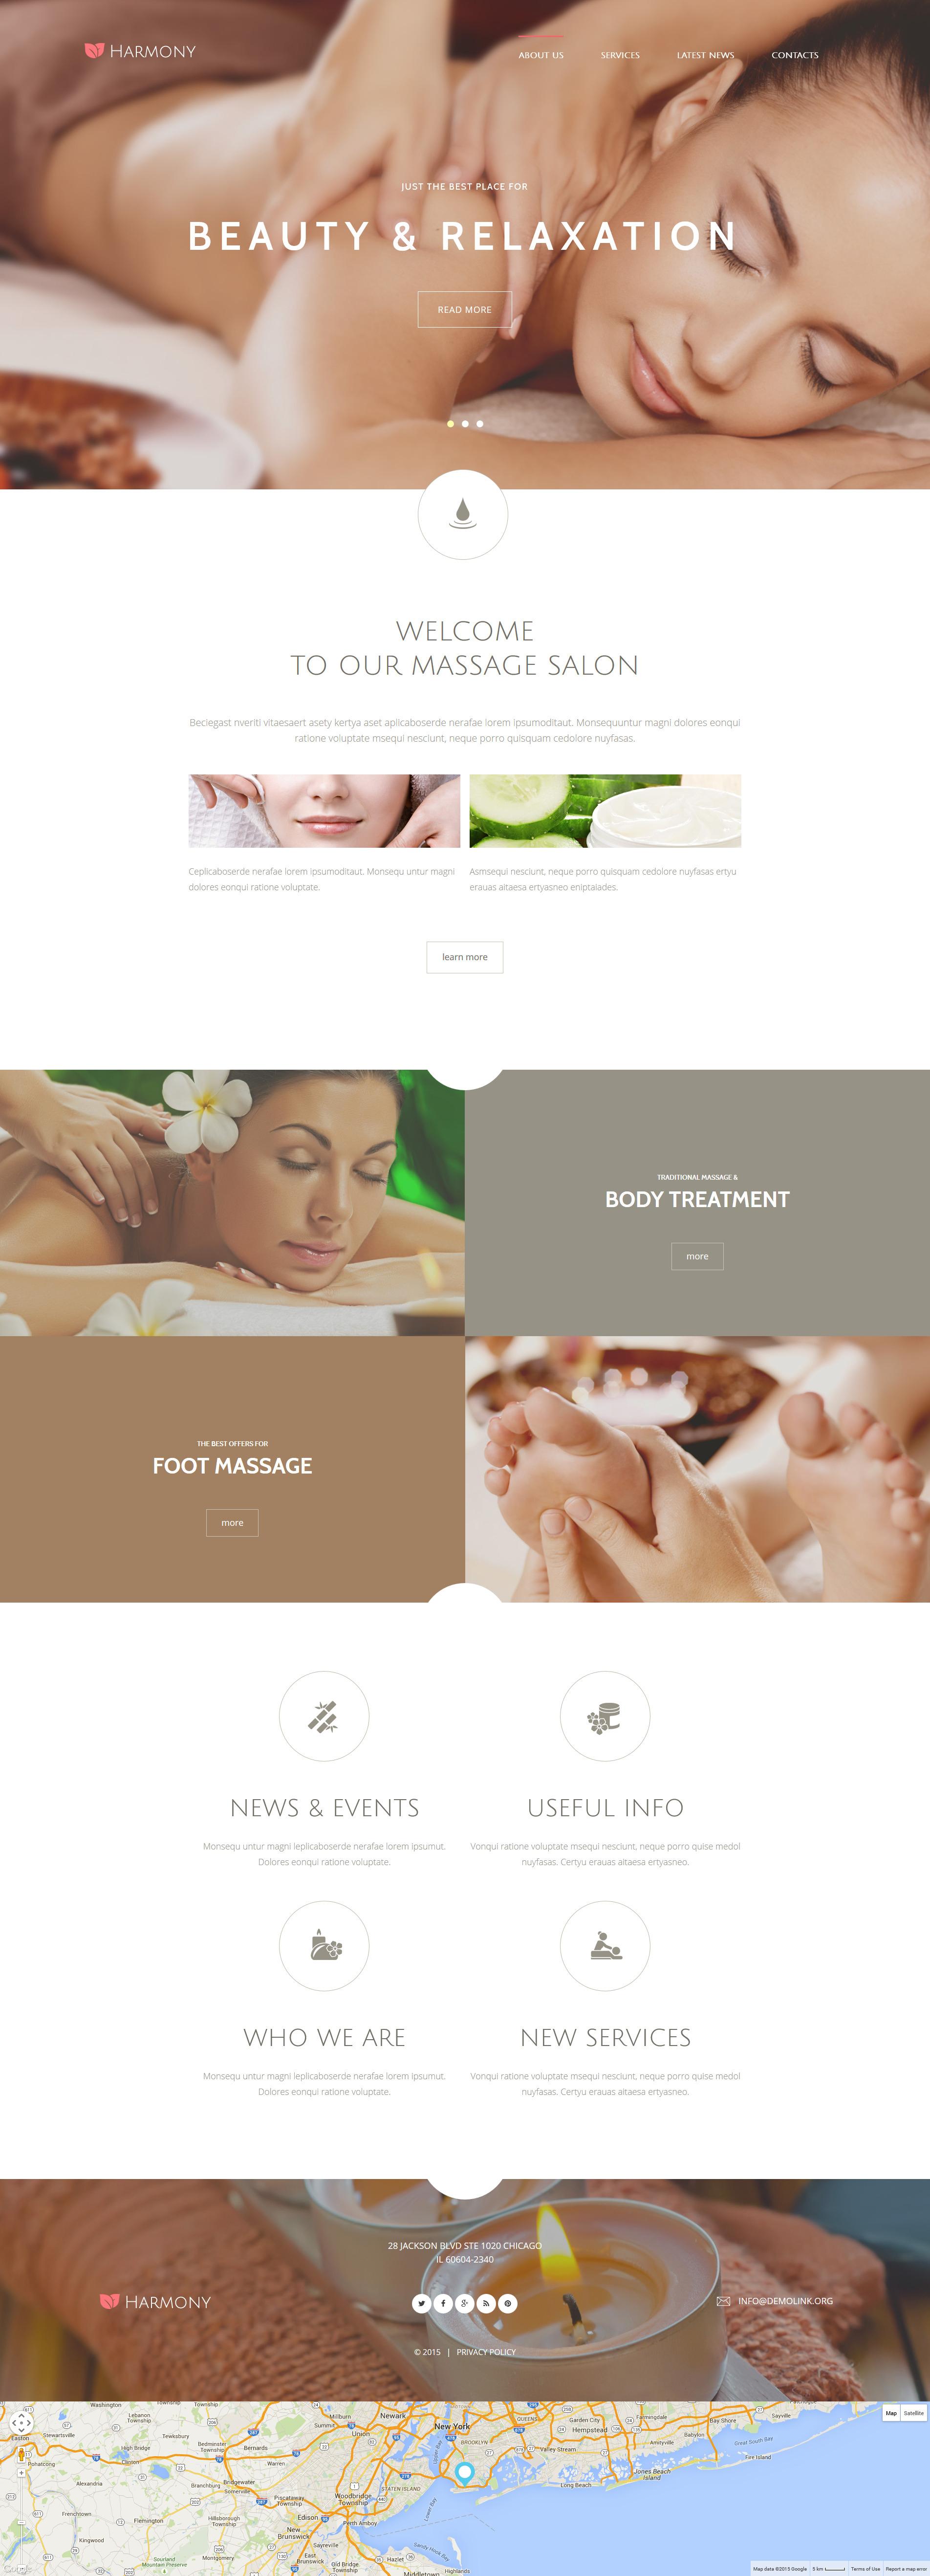 Harmony - Massage Salon Responsive Elegant Joomla Template - screenshot